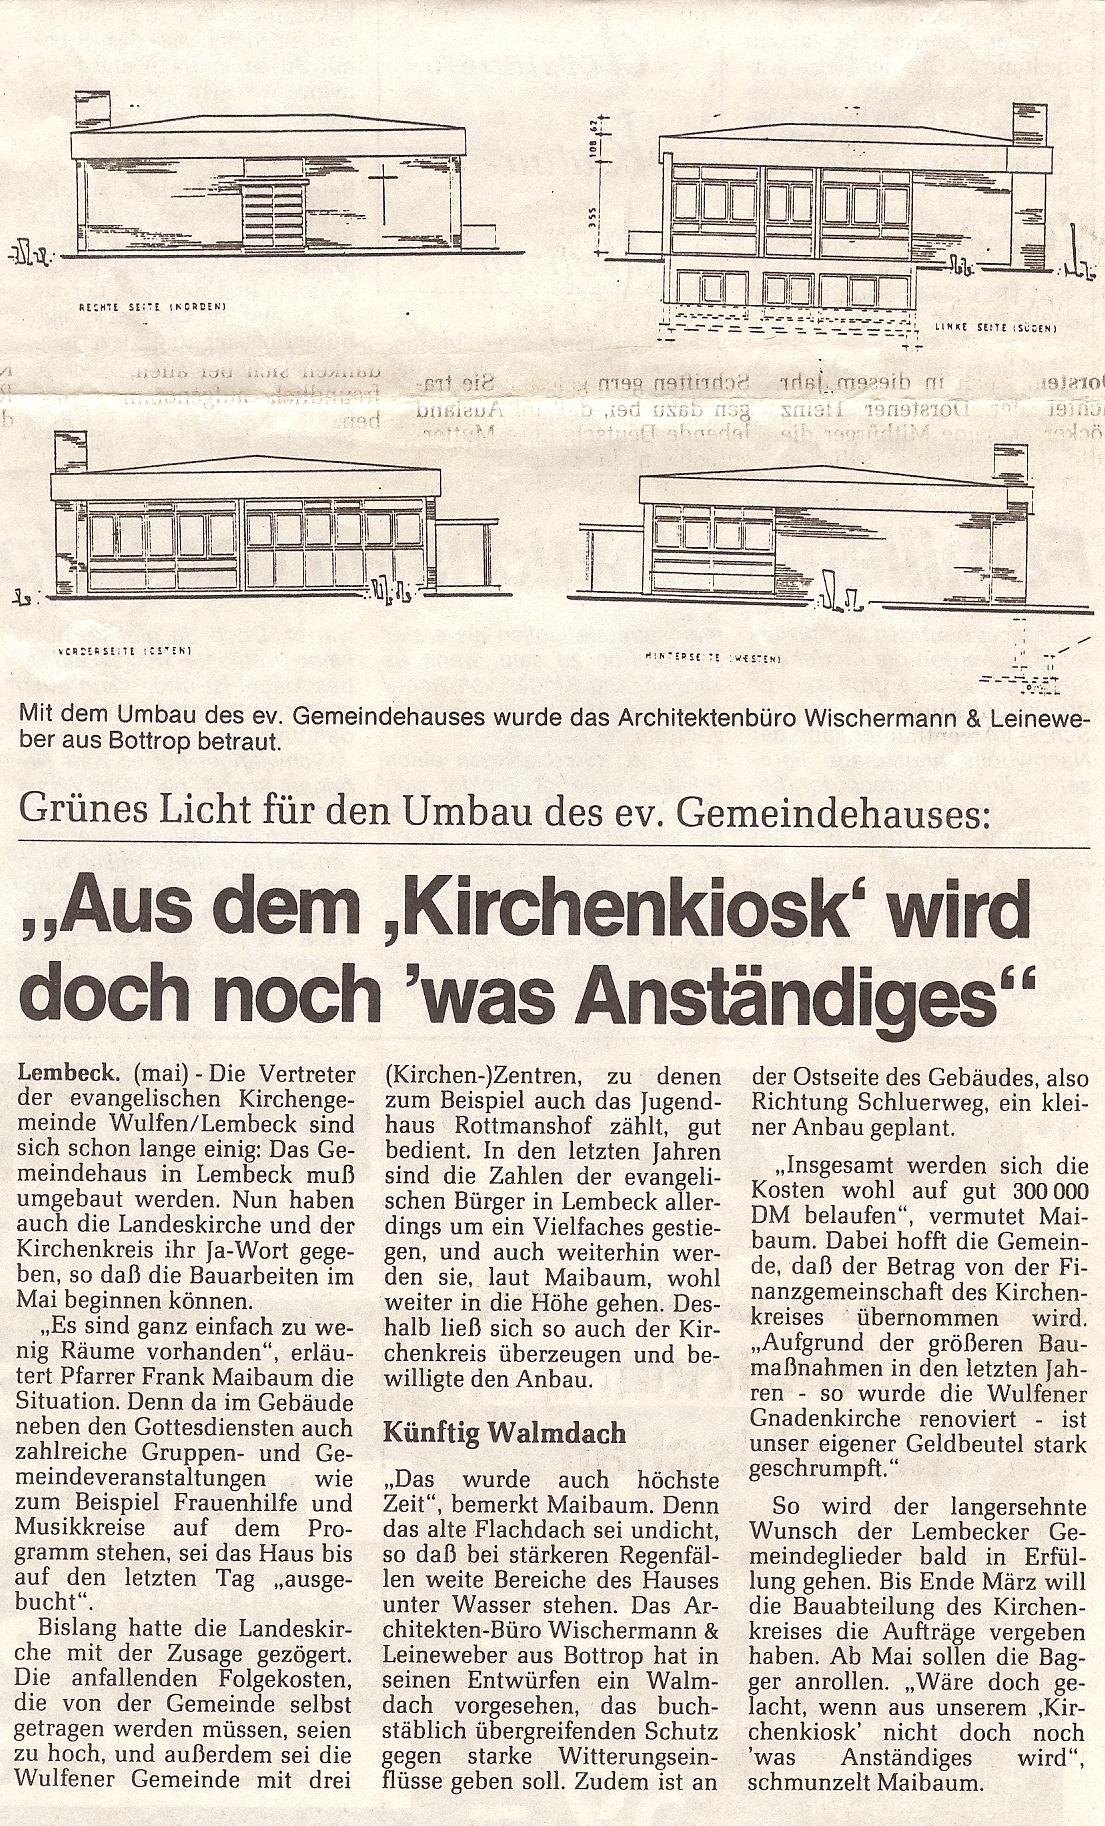 19920111_Stadtspiegel_Lembeck_02